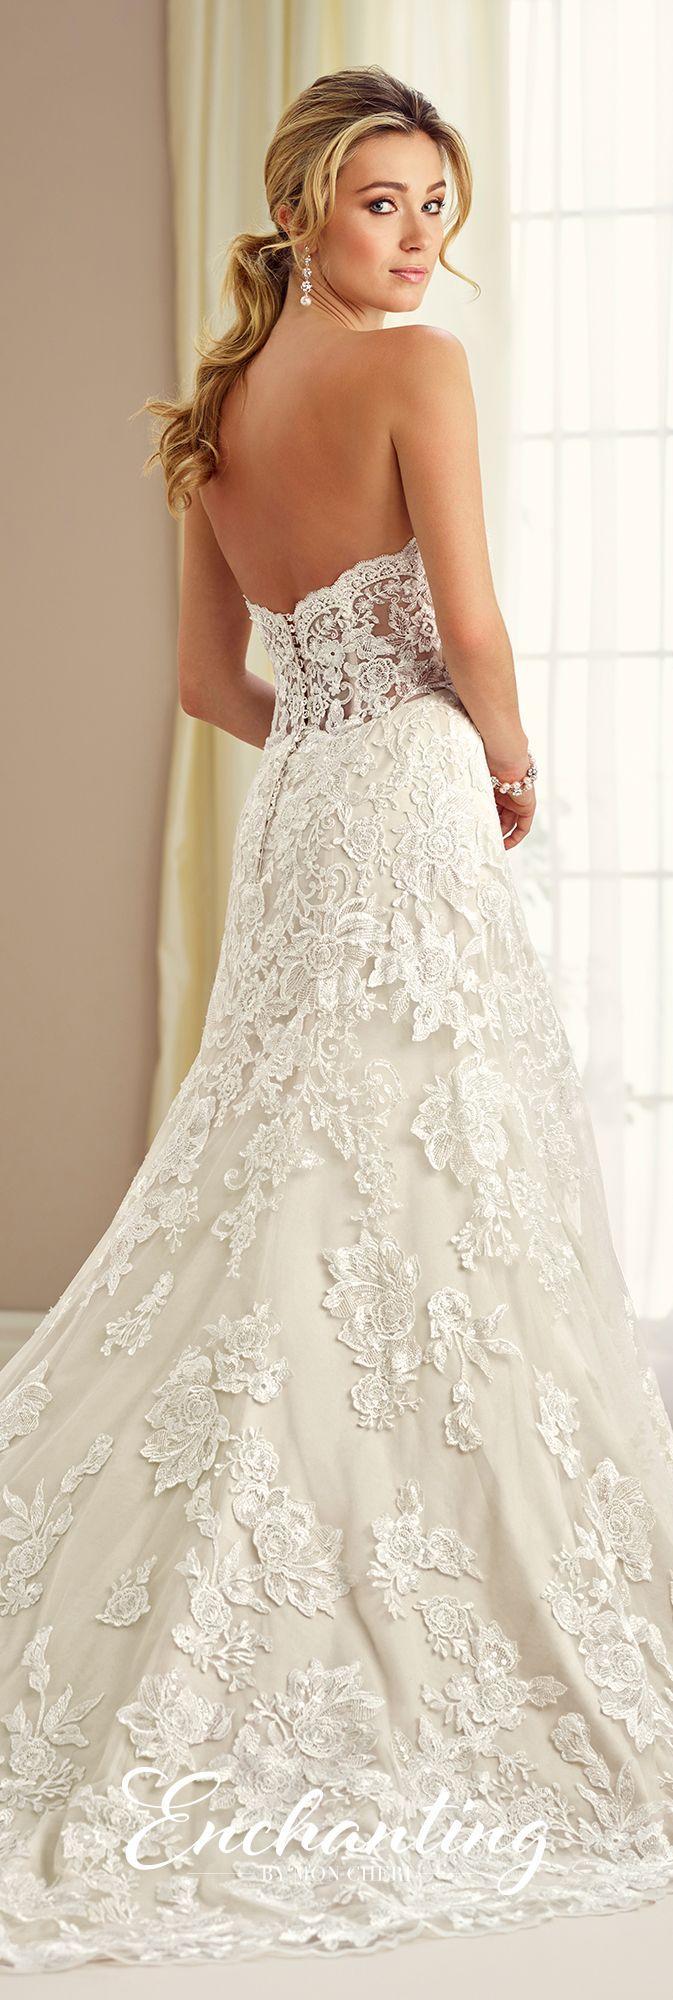 Свадьба - 217118